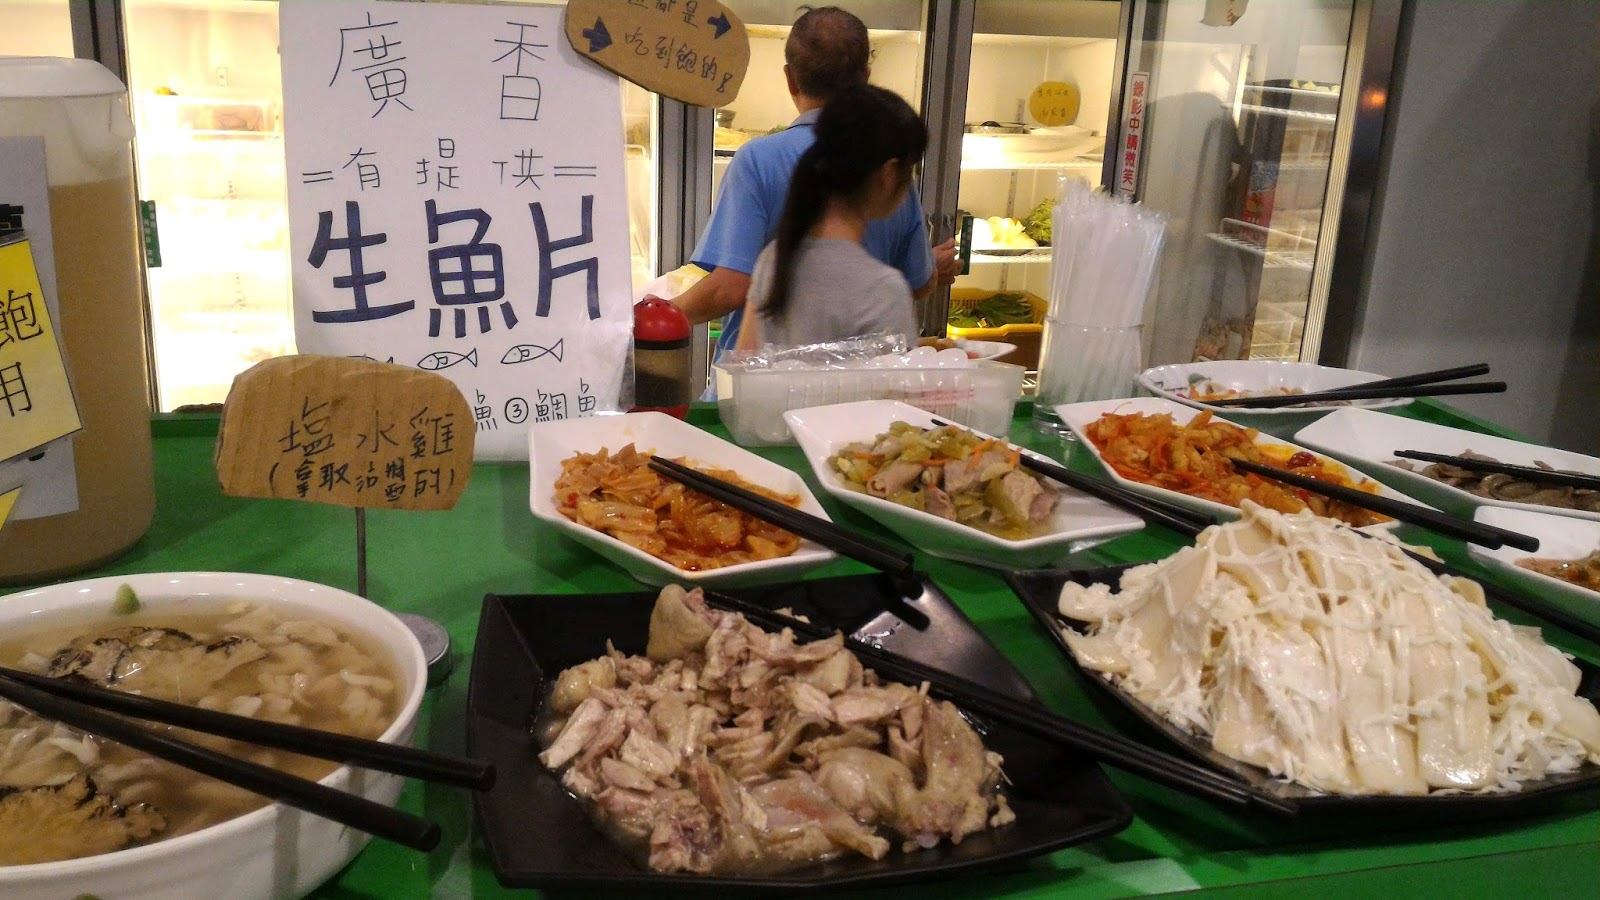 P 20160725 181734 - [食記] 廣香吃到飽日式涮涮鍋,超多種飲料、冰品及甜點!